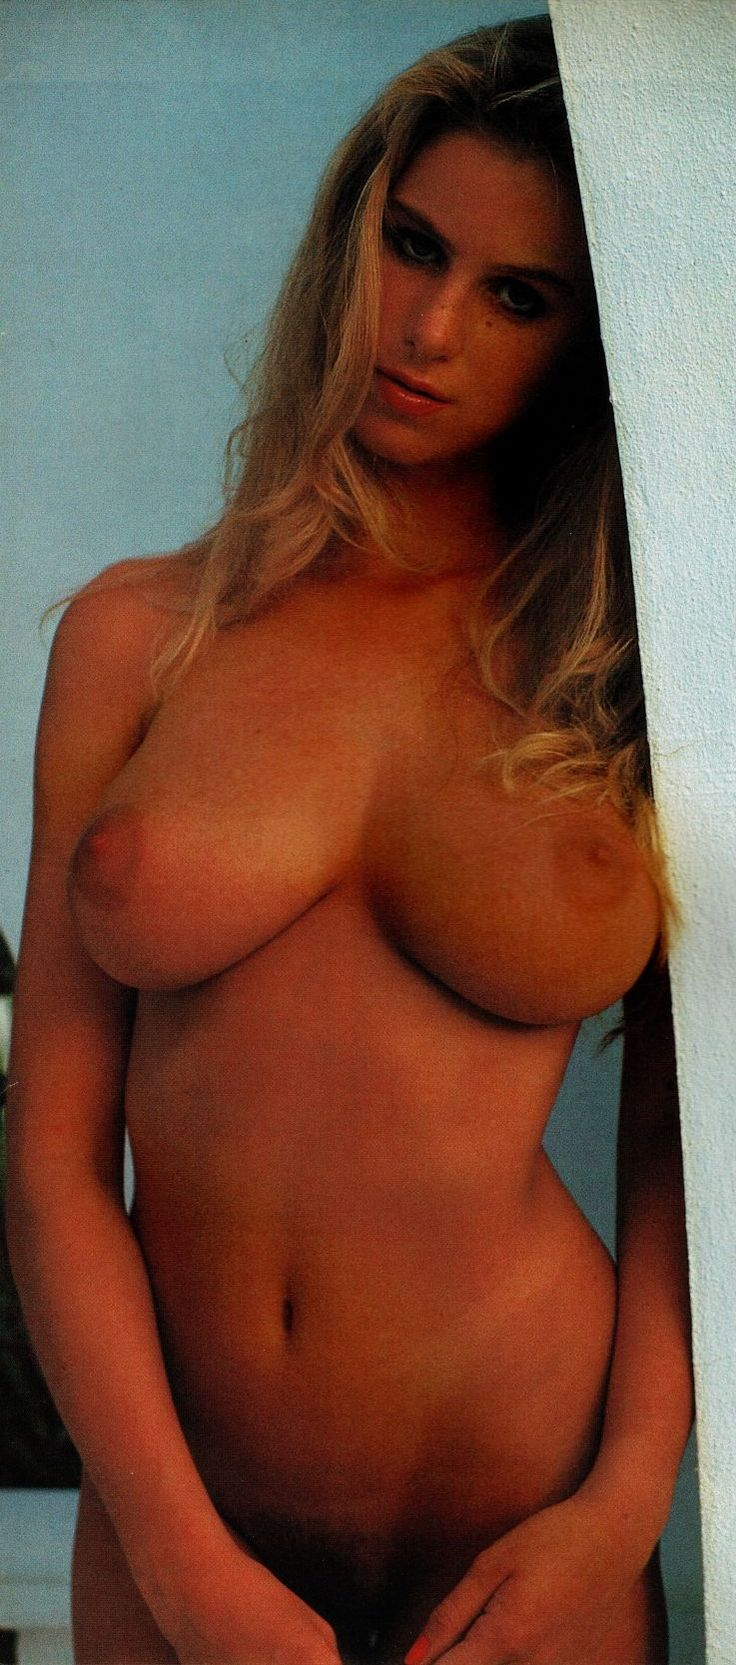 Kerri kasem bikini